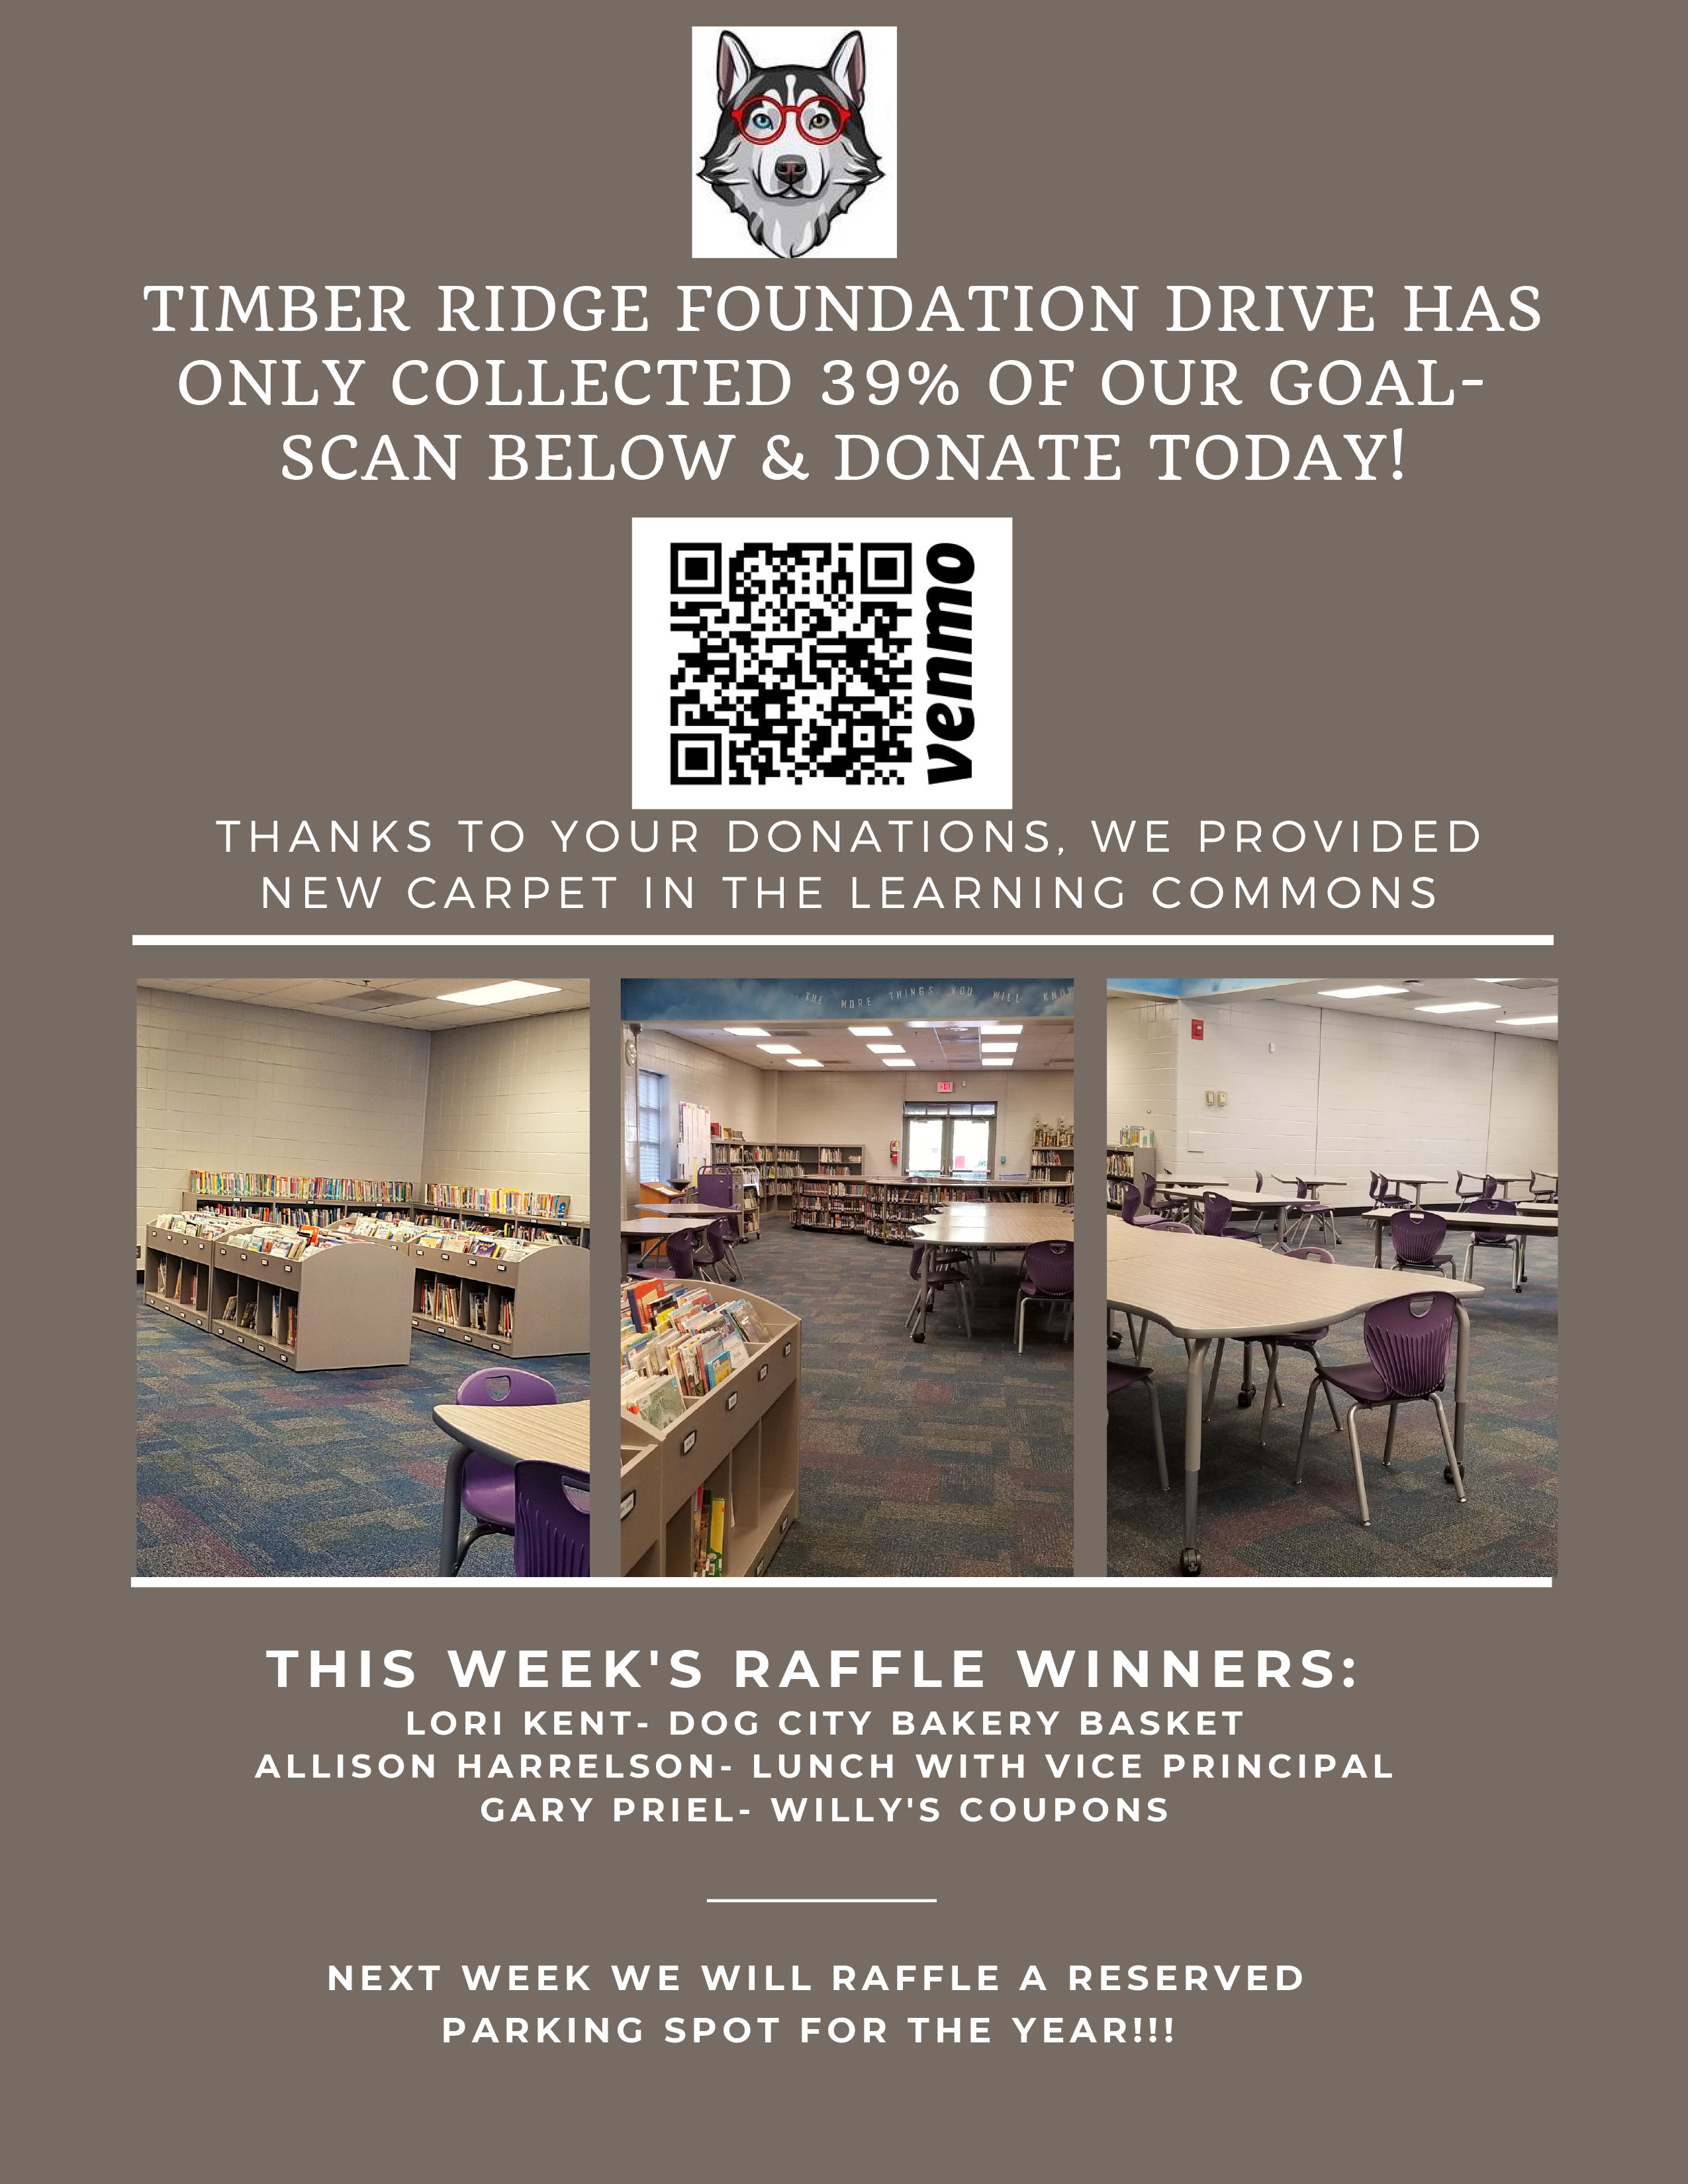 TR Foundation Drive 10.12.20